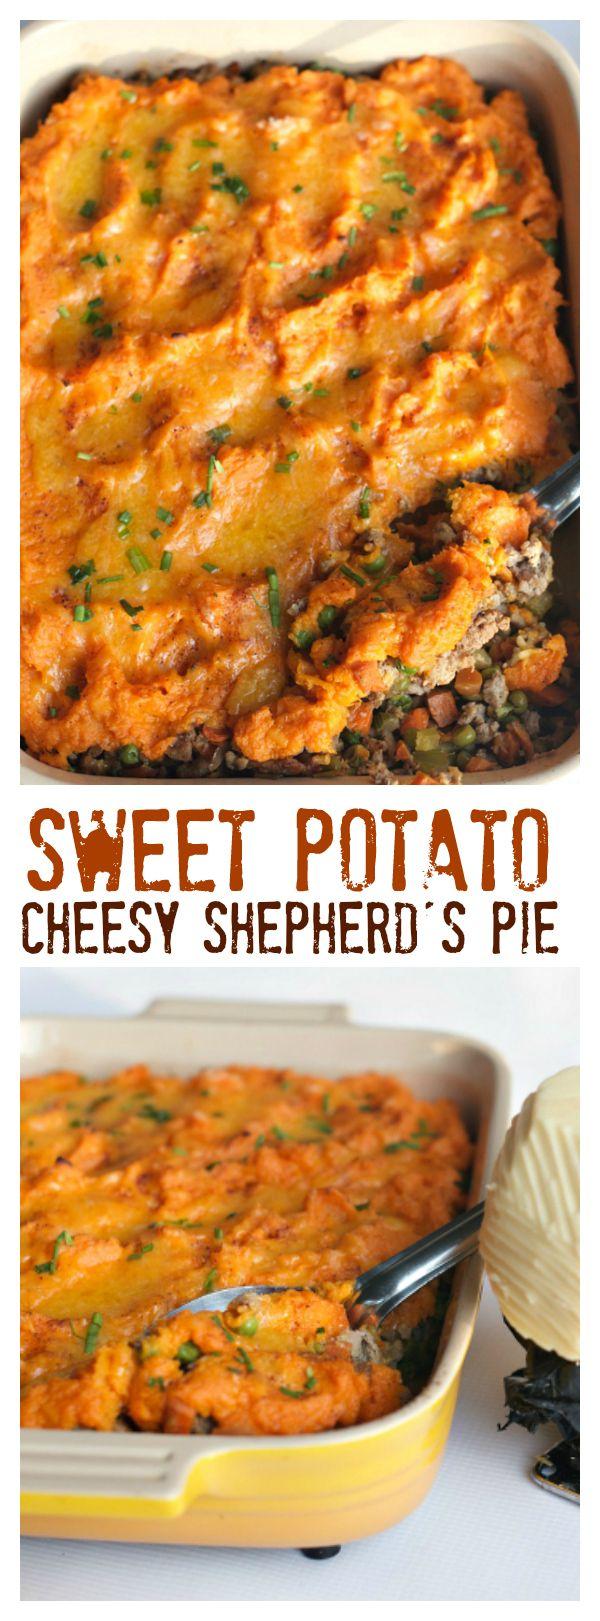 Sweet Potato Shepherd's Pie with Cheese Recipe